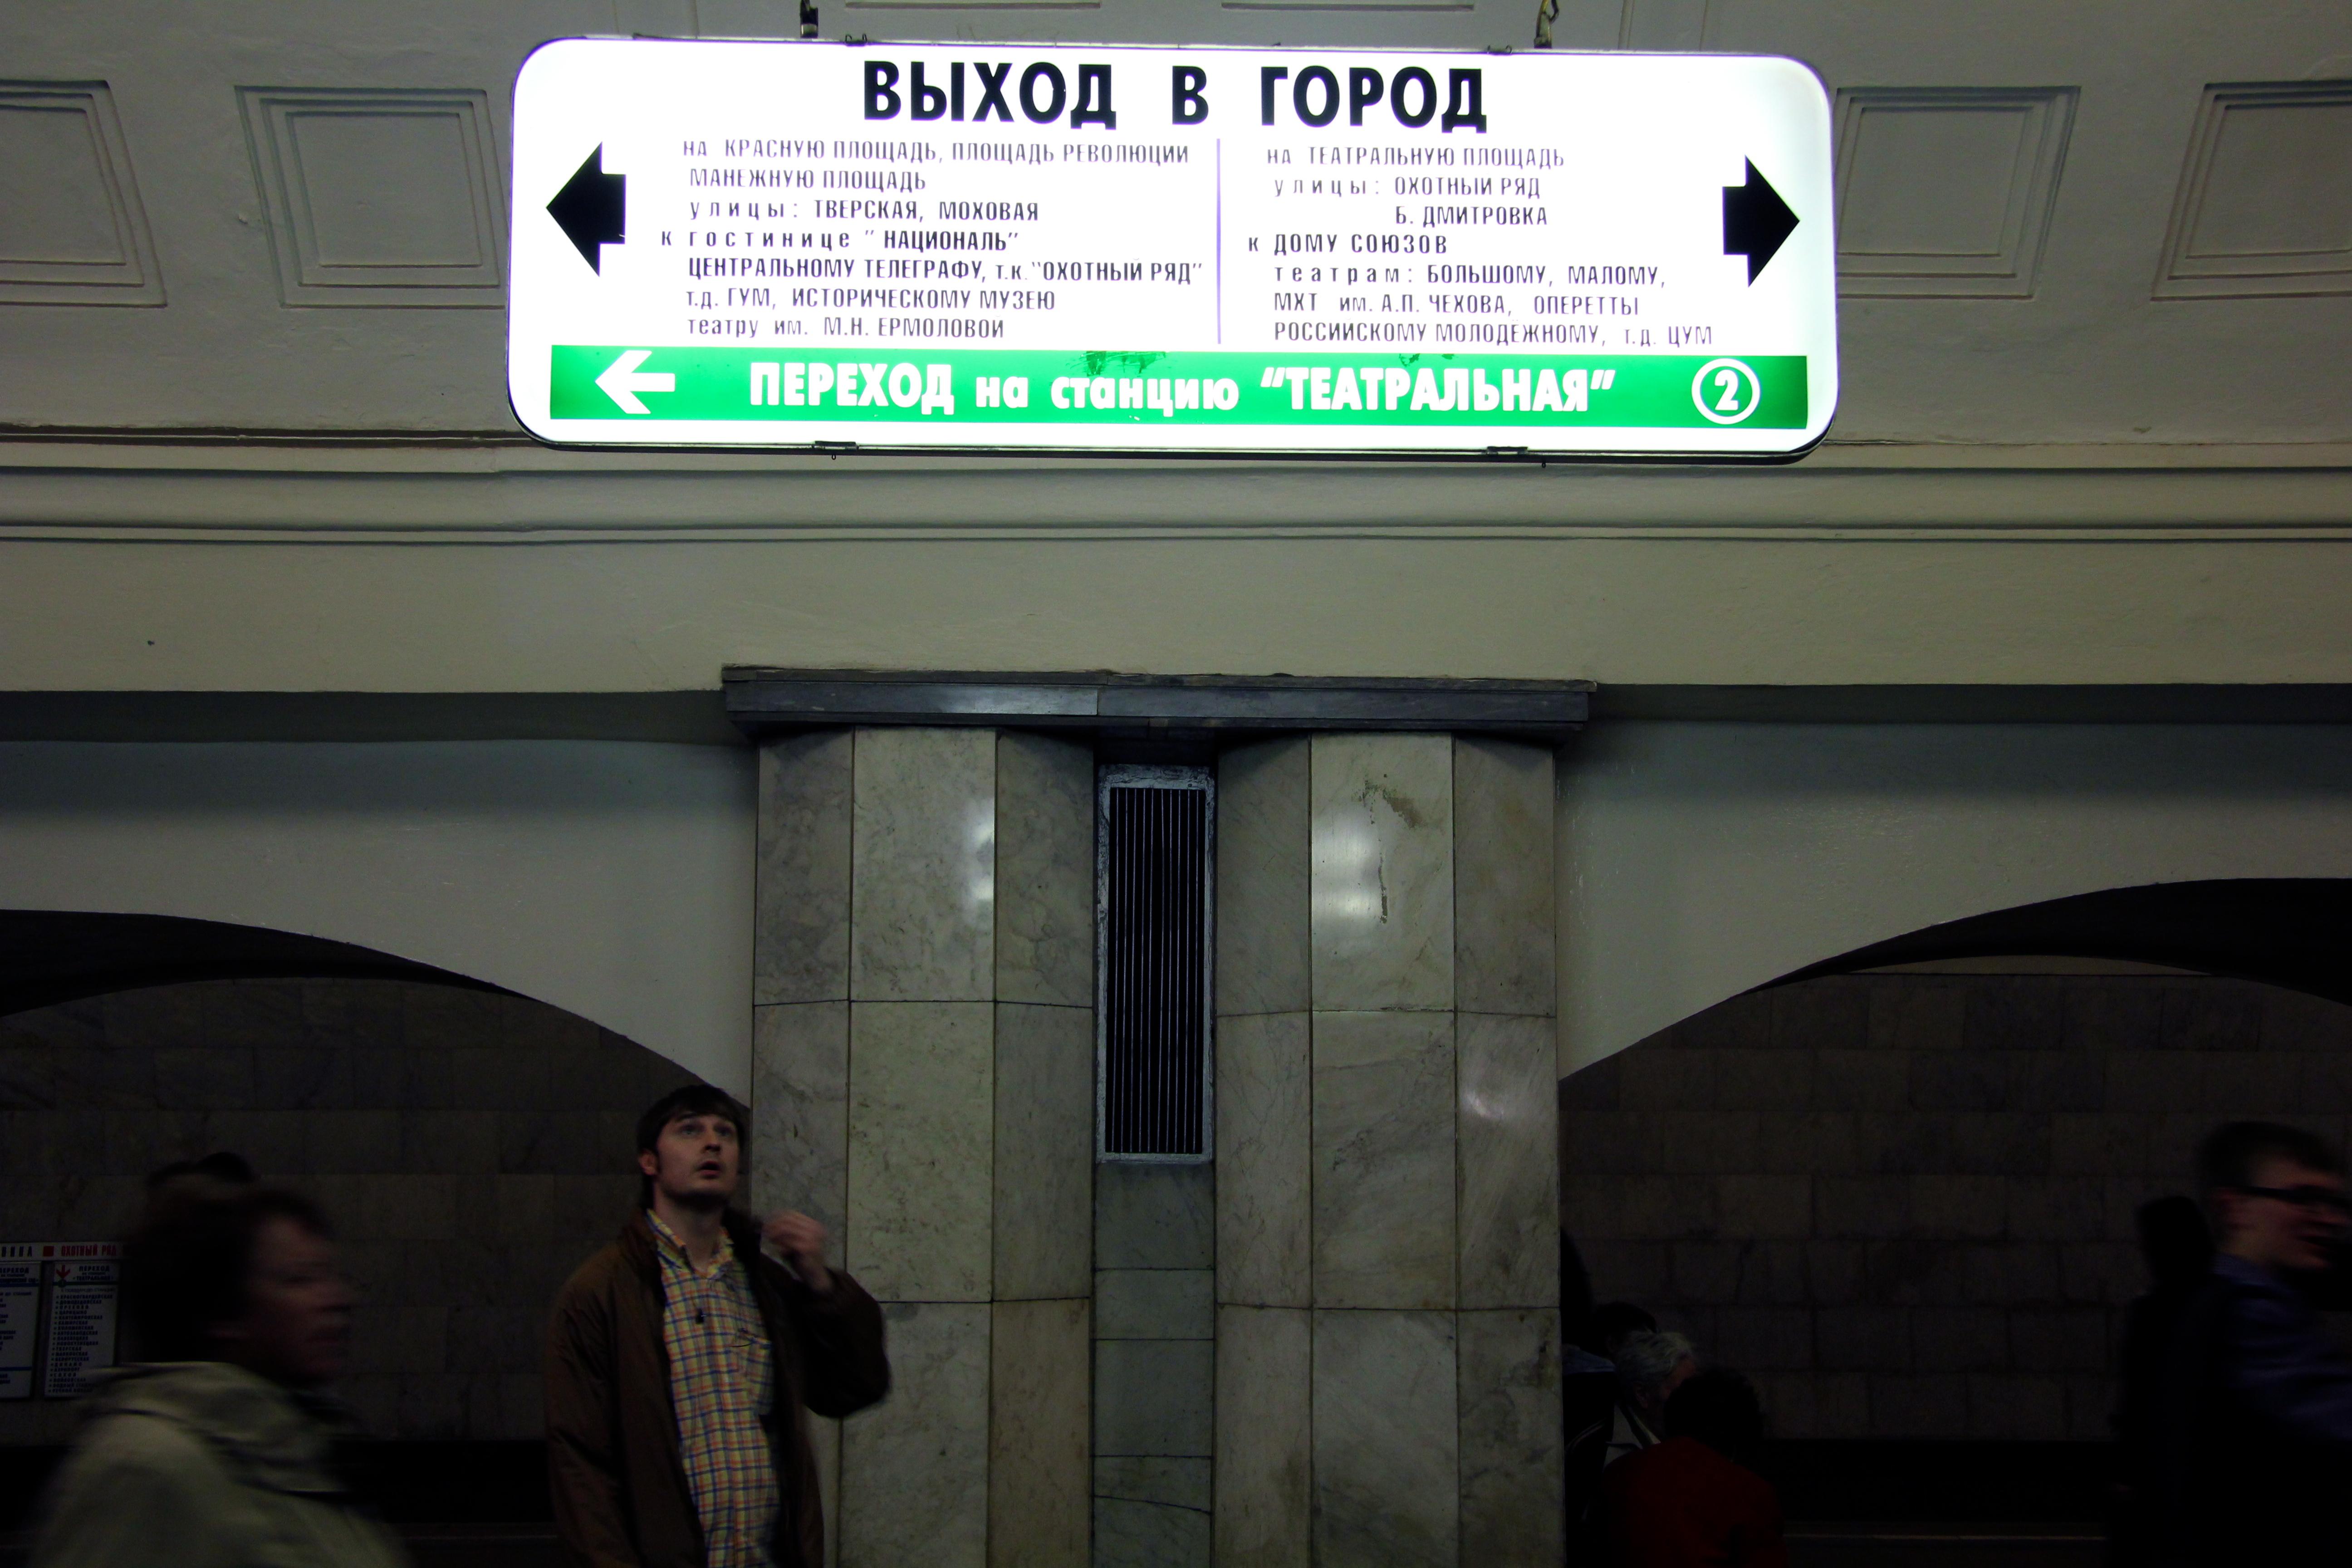 Файл Okhotny Ryad (Охотный Ряд) (5880809752).jpg — Википедия 5b8e9c403e1